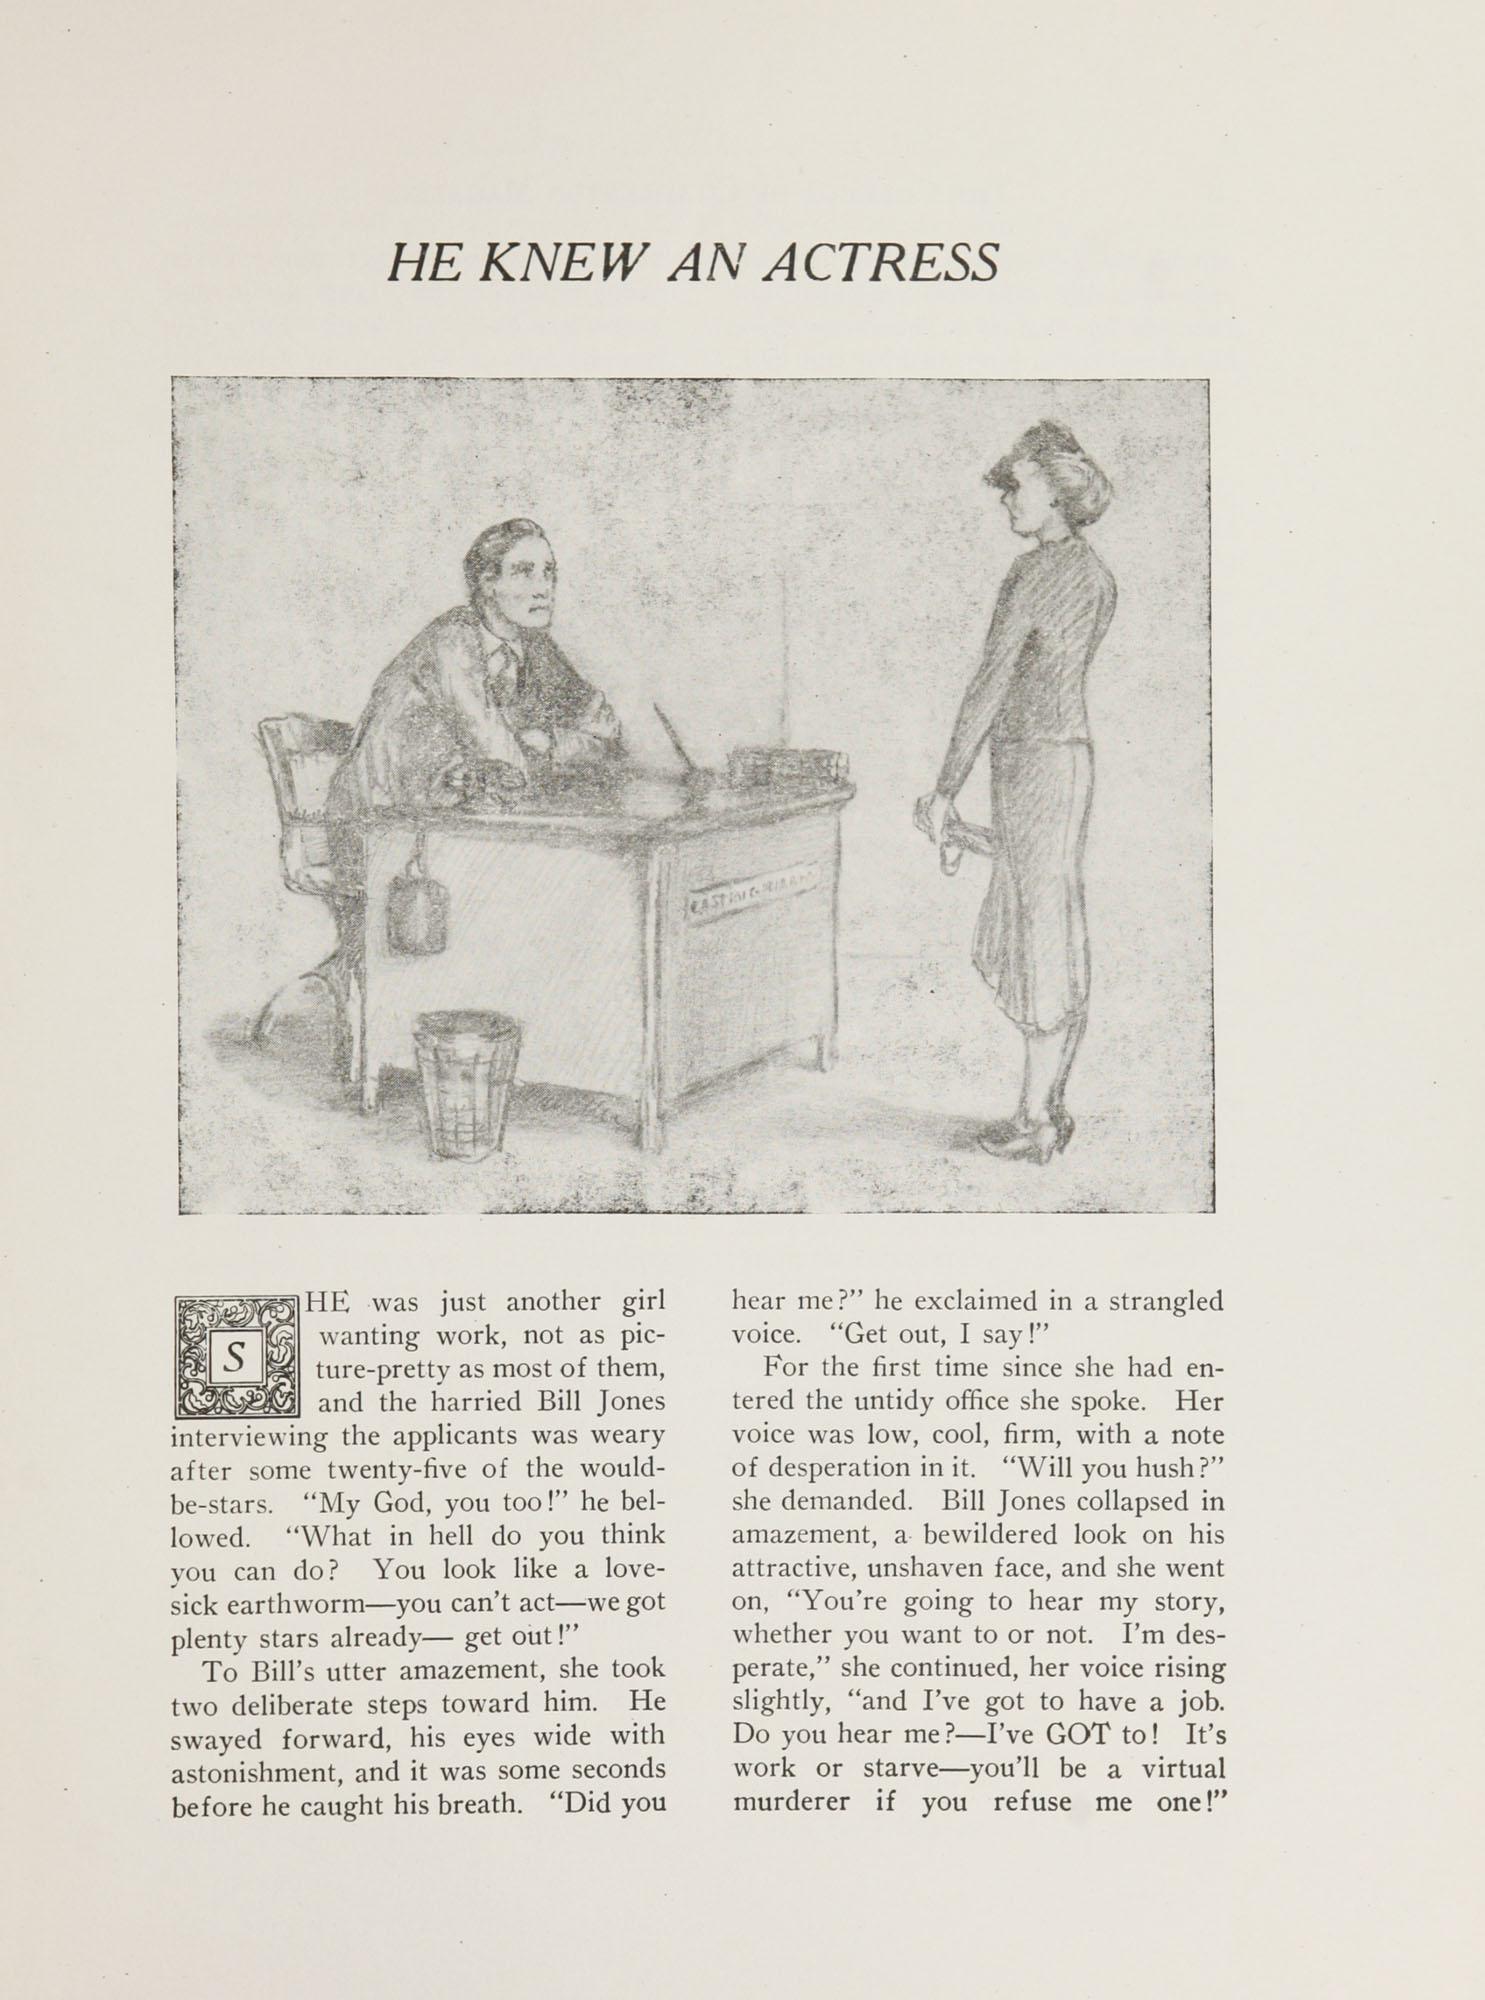 College of Charleston Magazine, 1937-1938, Vol. XXXXI No. 1, page 7